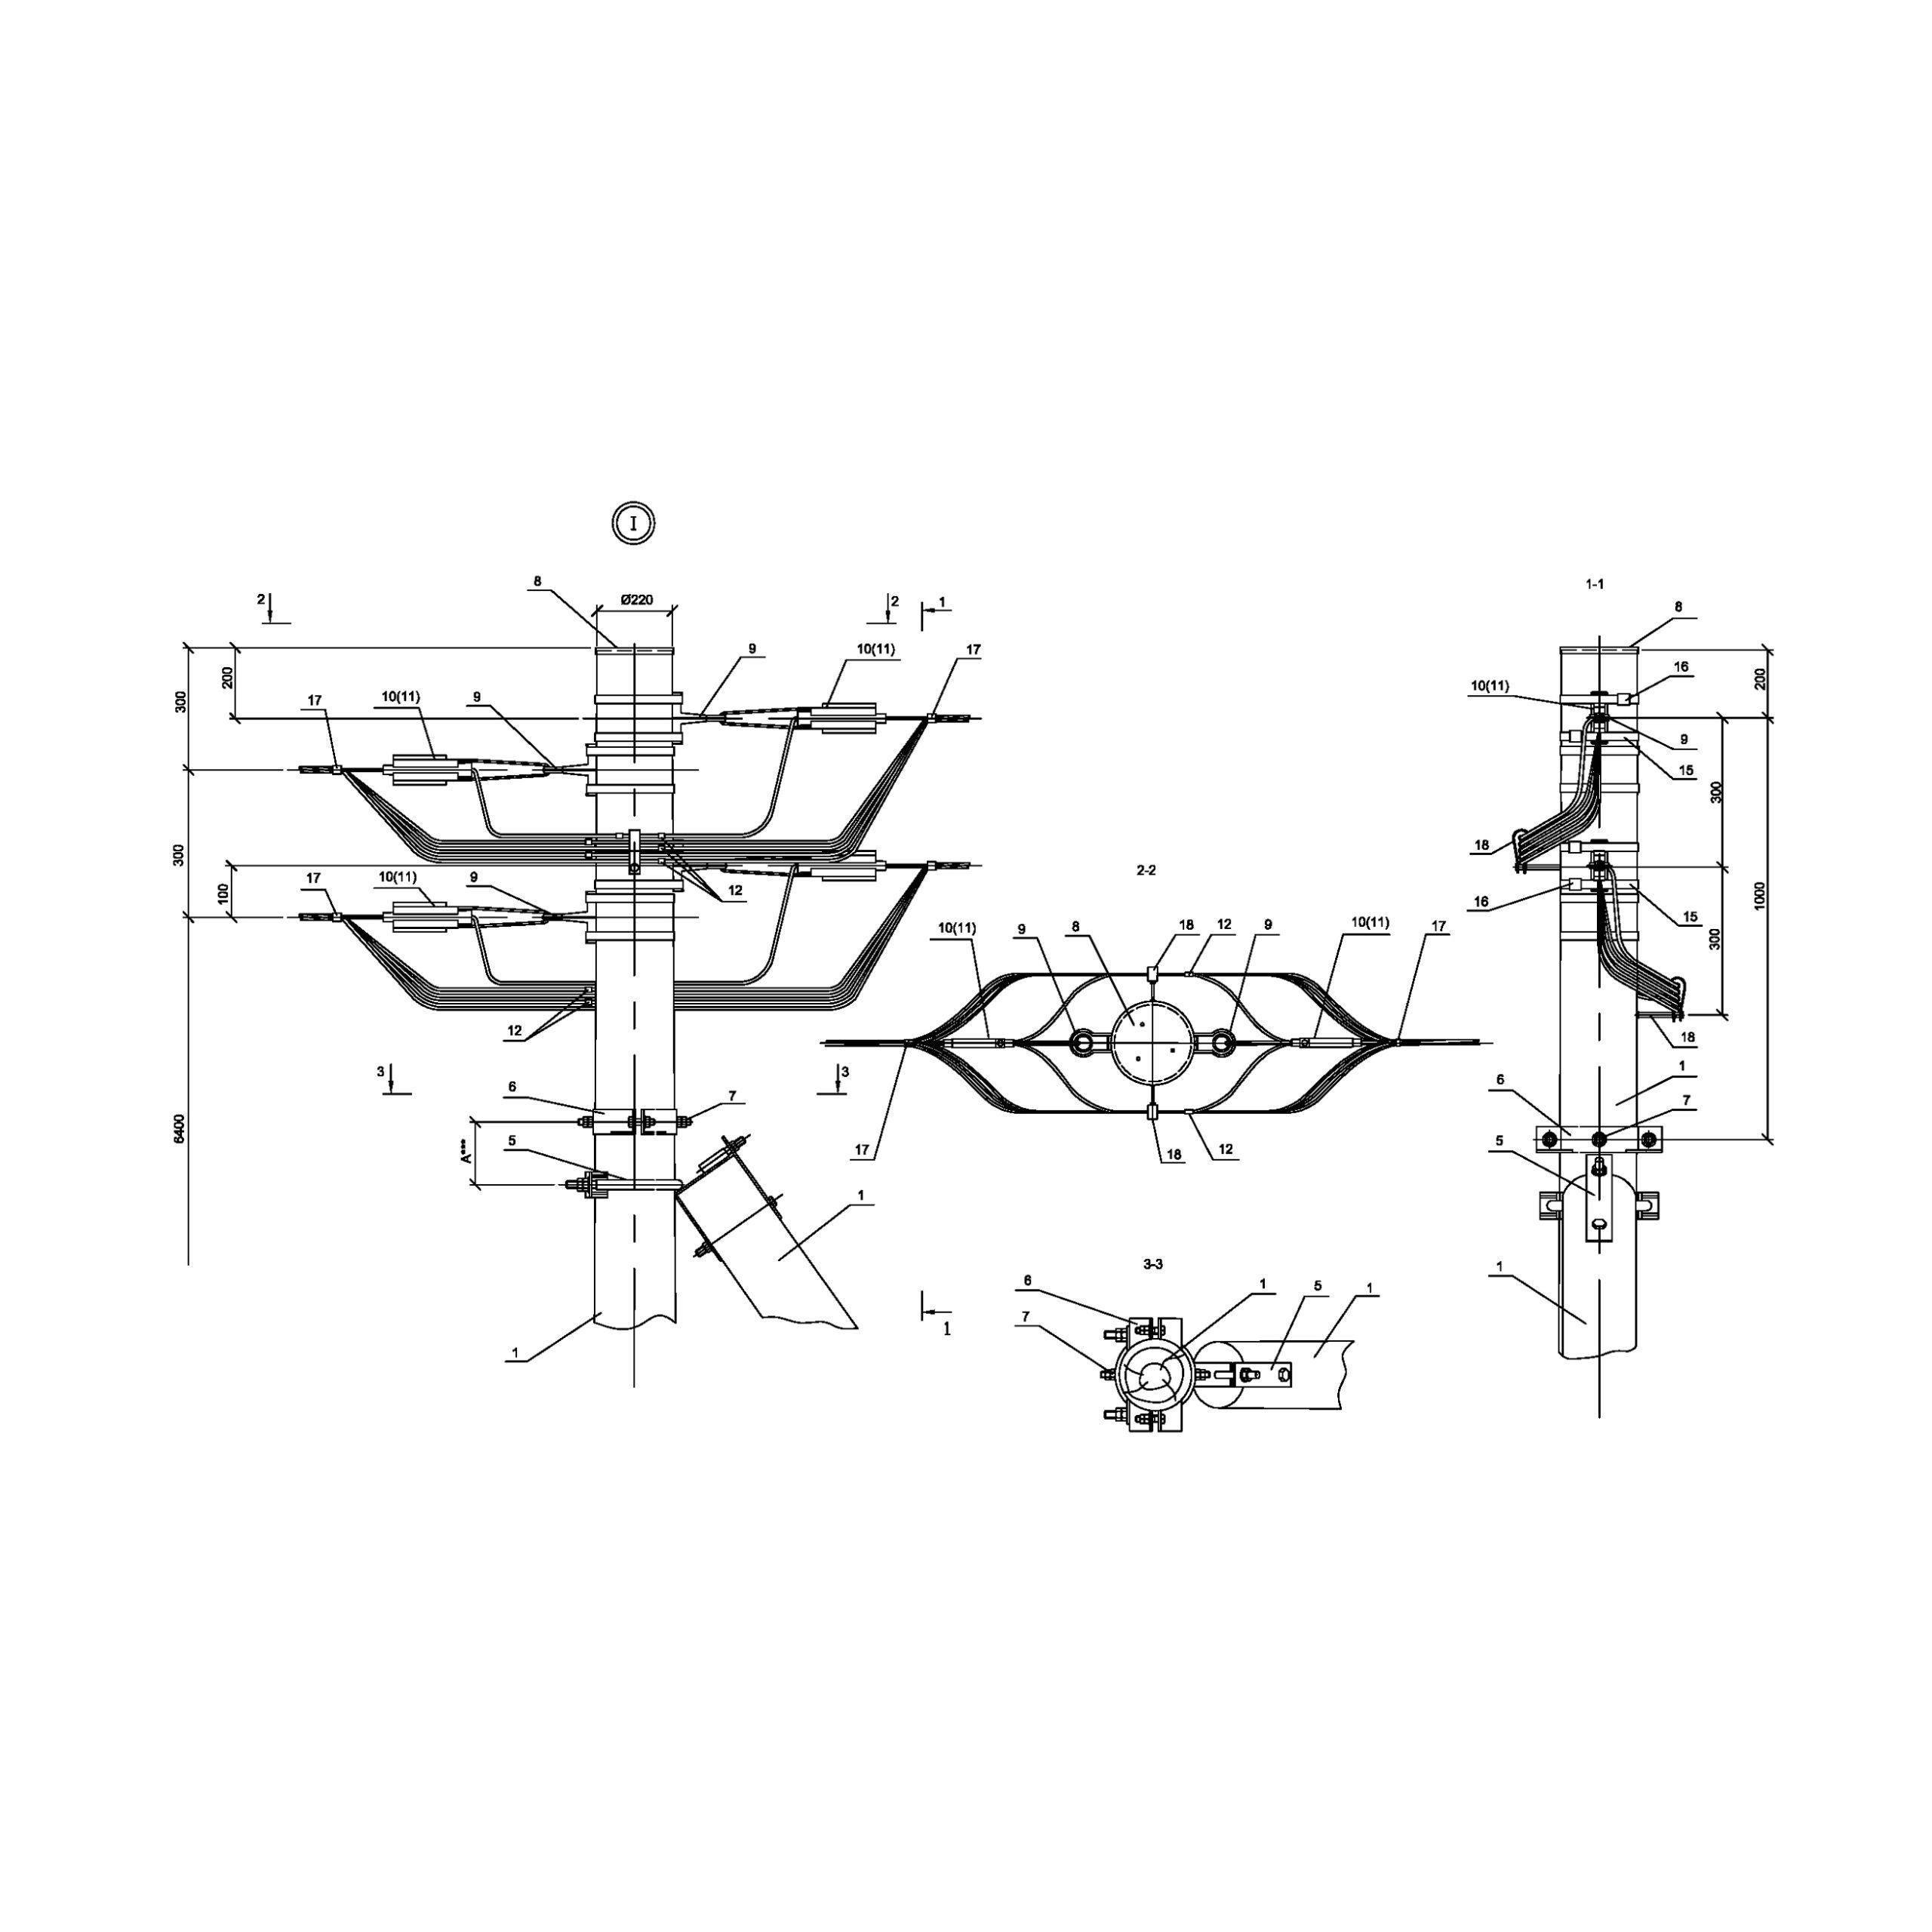 Опора Ад16 деревянная анкерная концевая двухцепная IEK